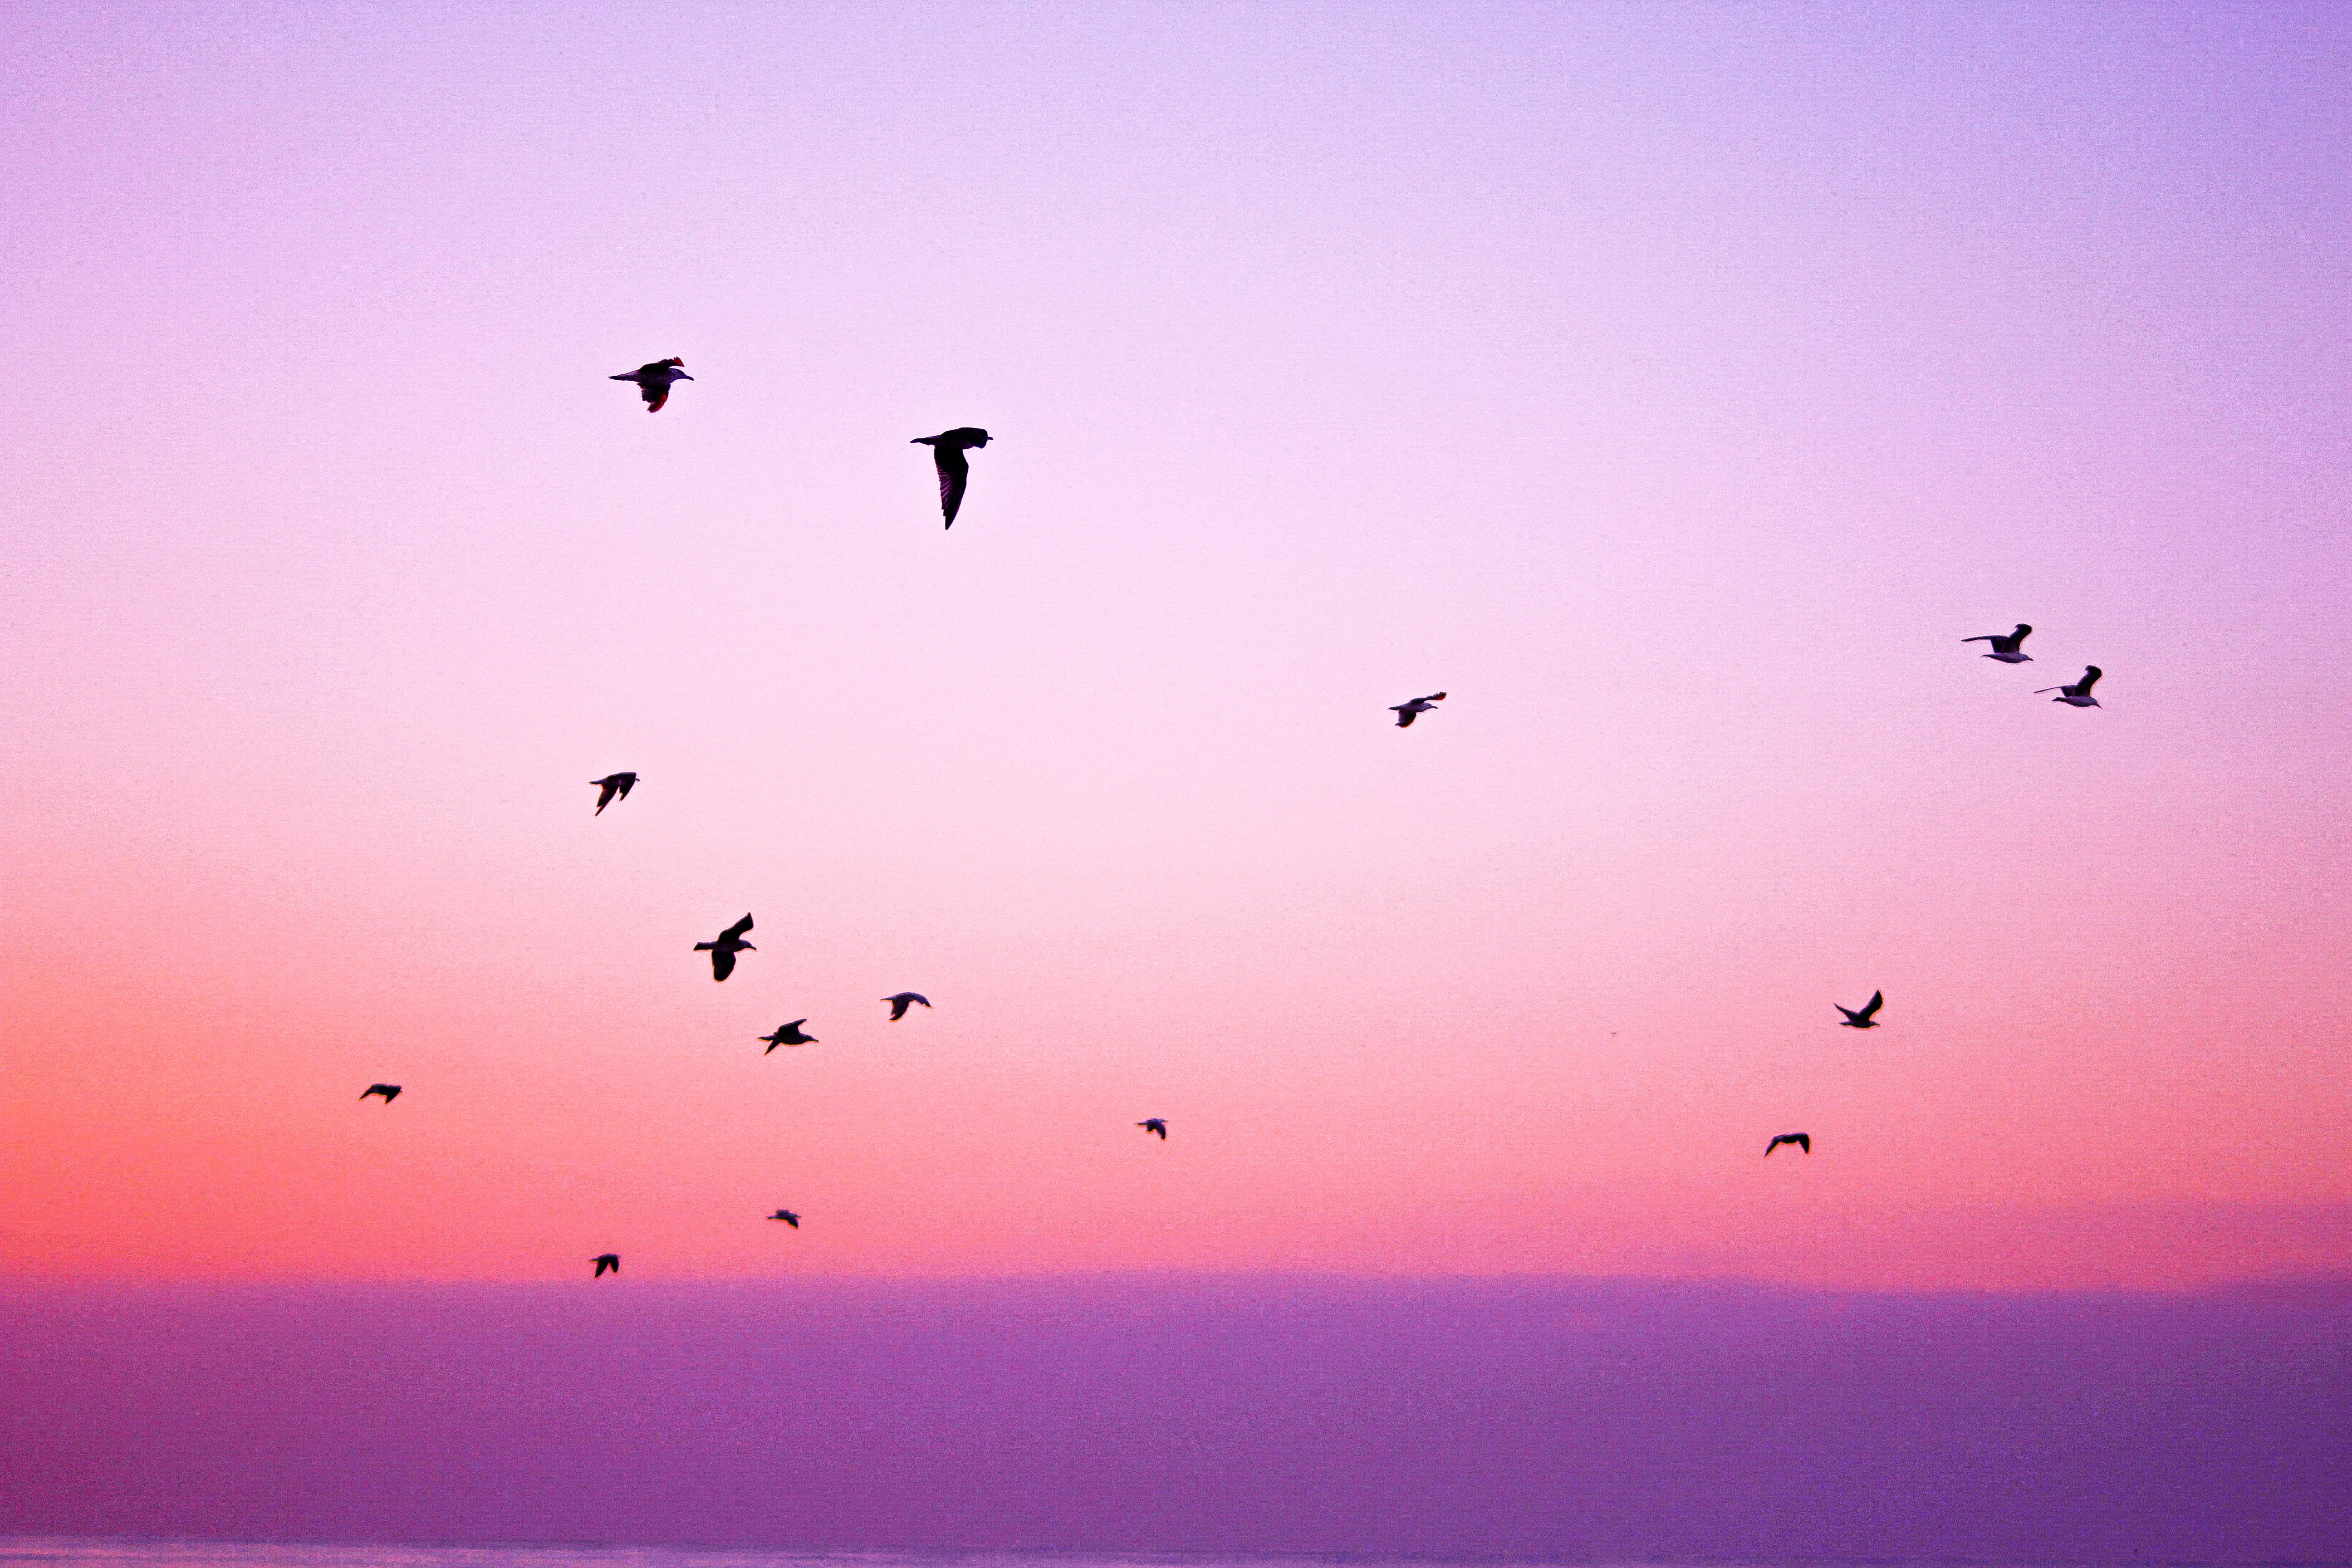 nature-sky-bird-animals-21261